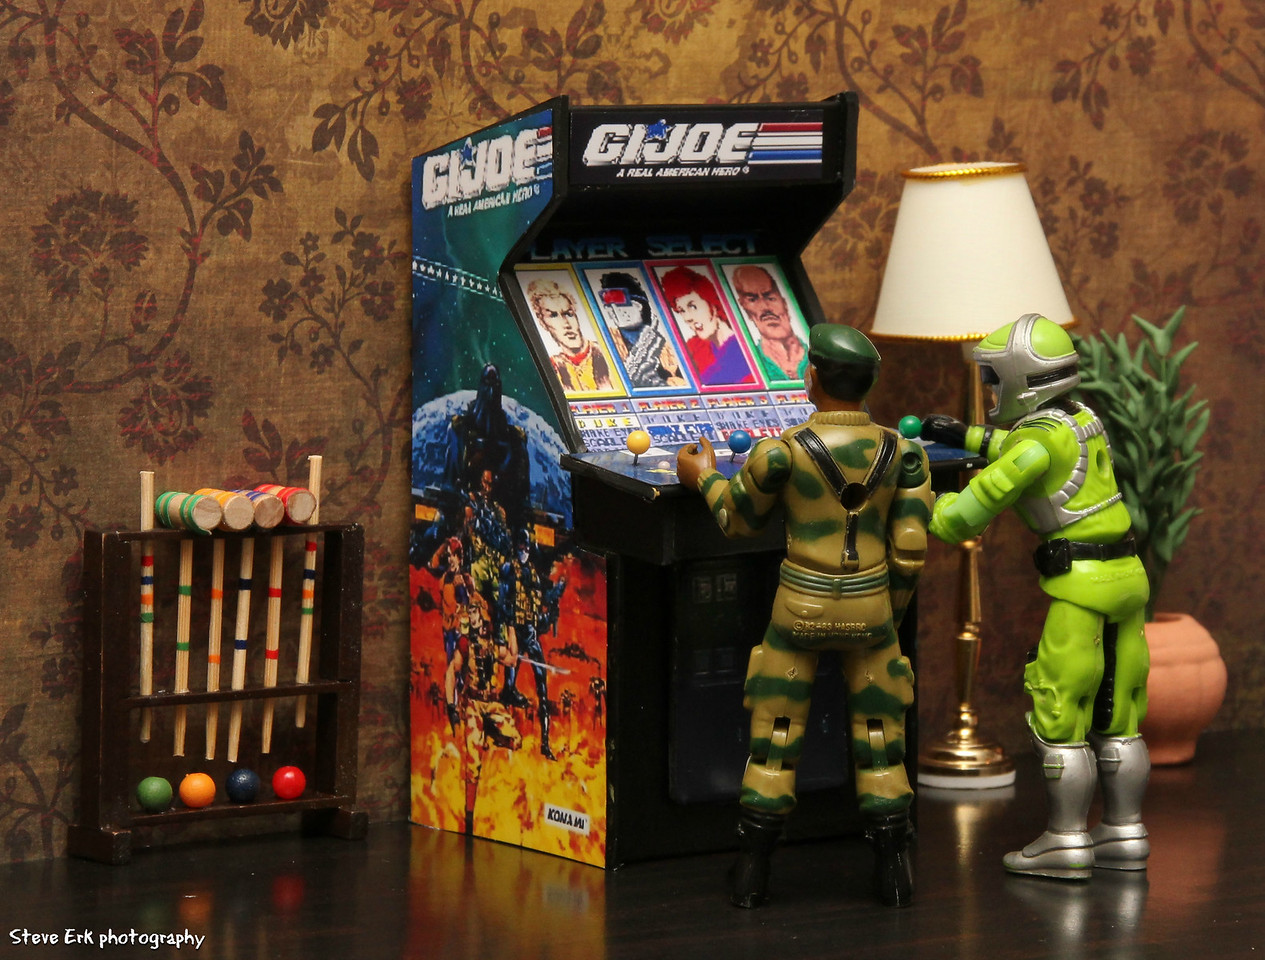 G.I. Joe playing G.I. Joe